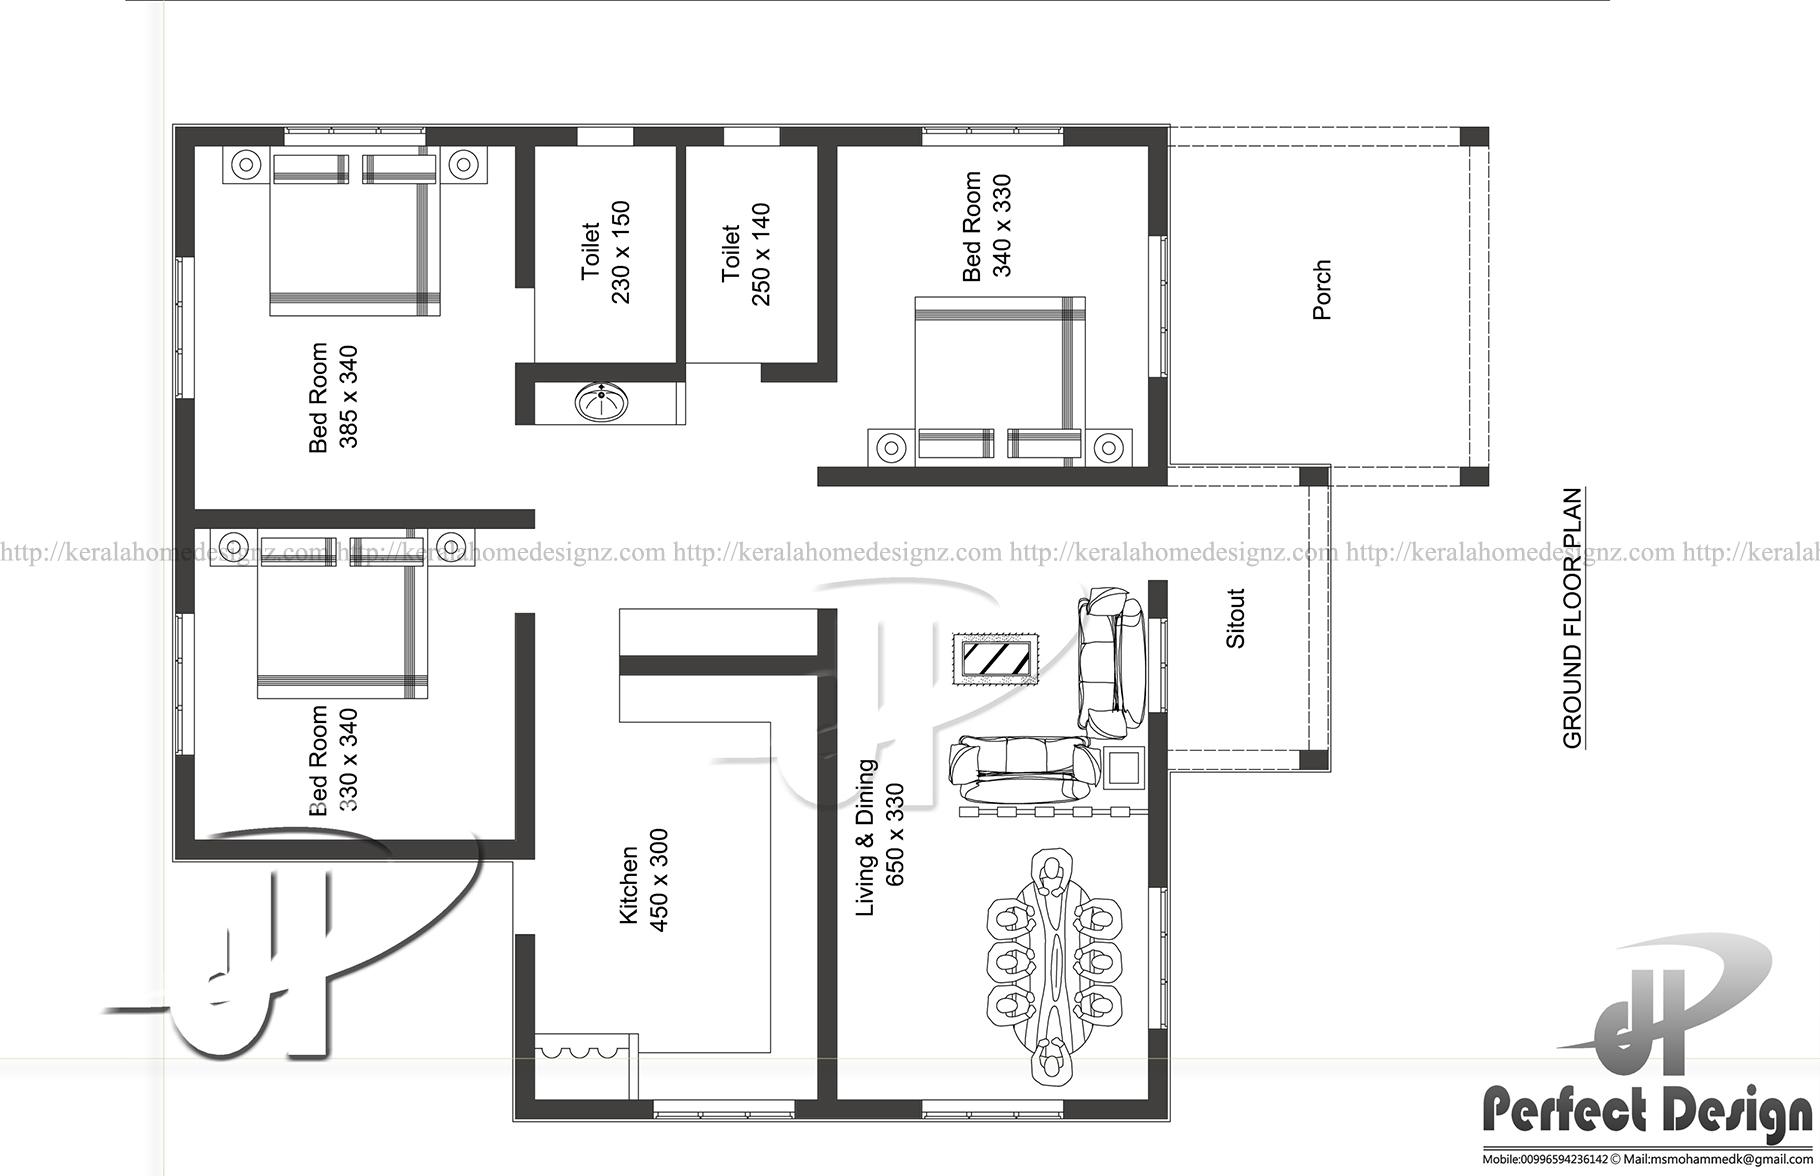 1086 SQ FT MODERN HOME DESIGN Kerala Home Design